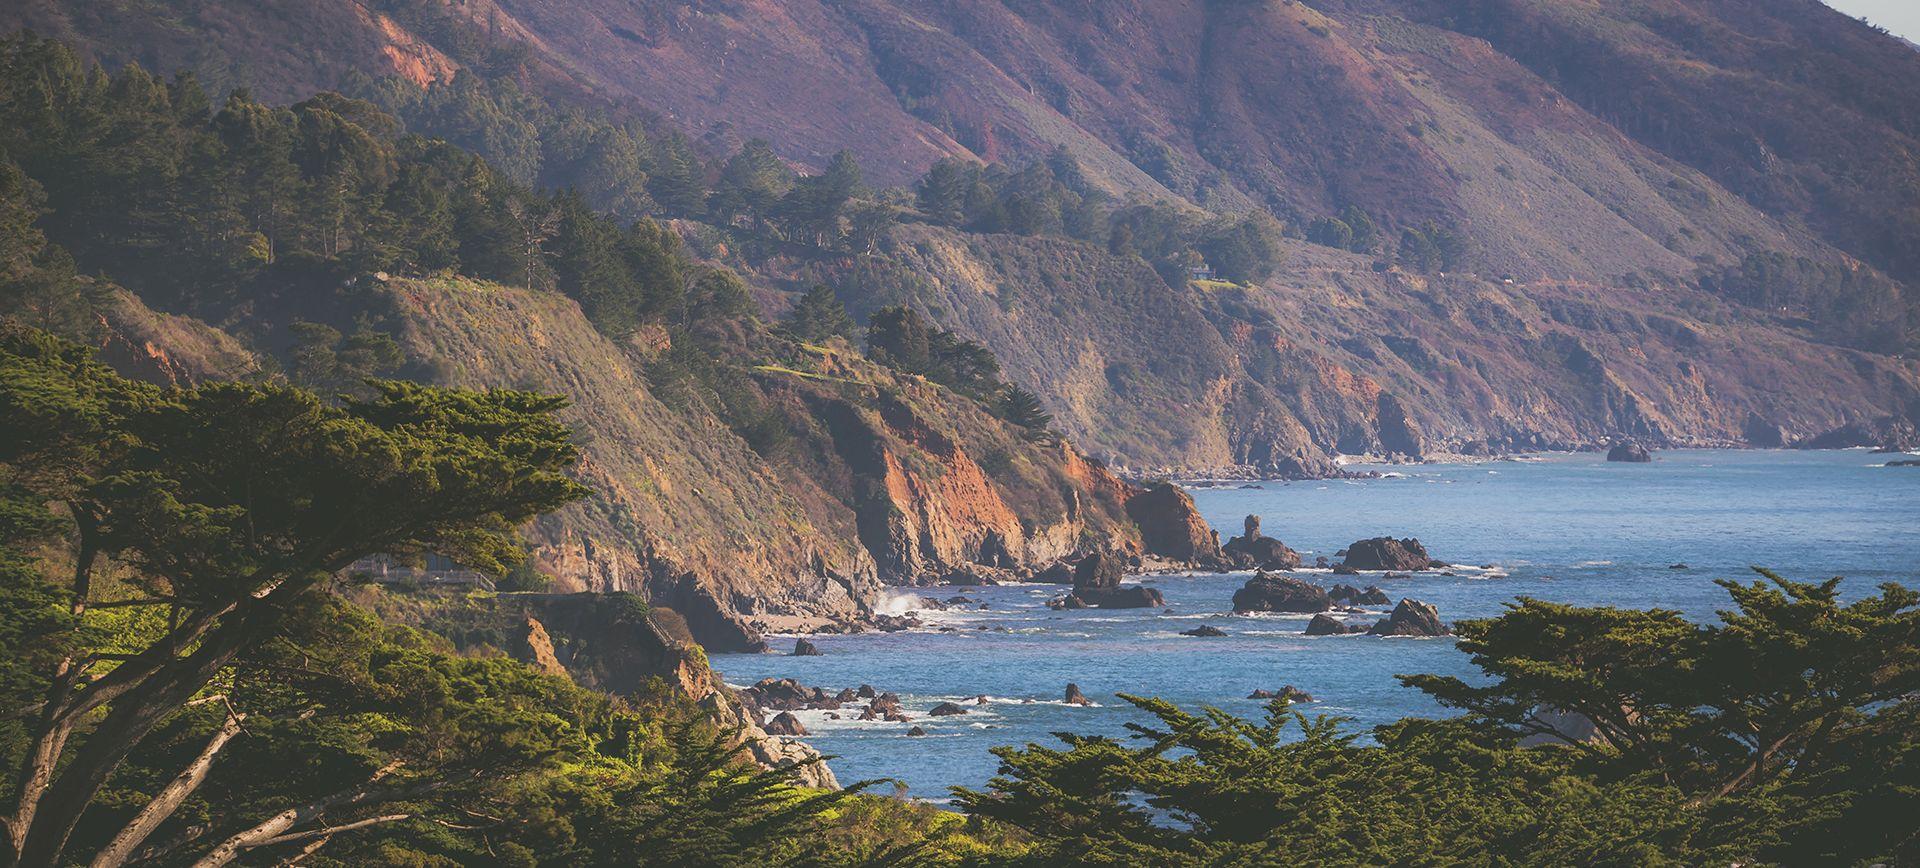 Big Sur Adventure Photography